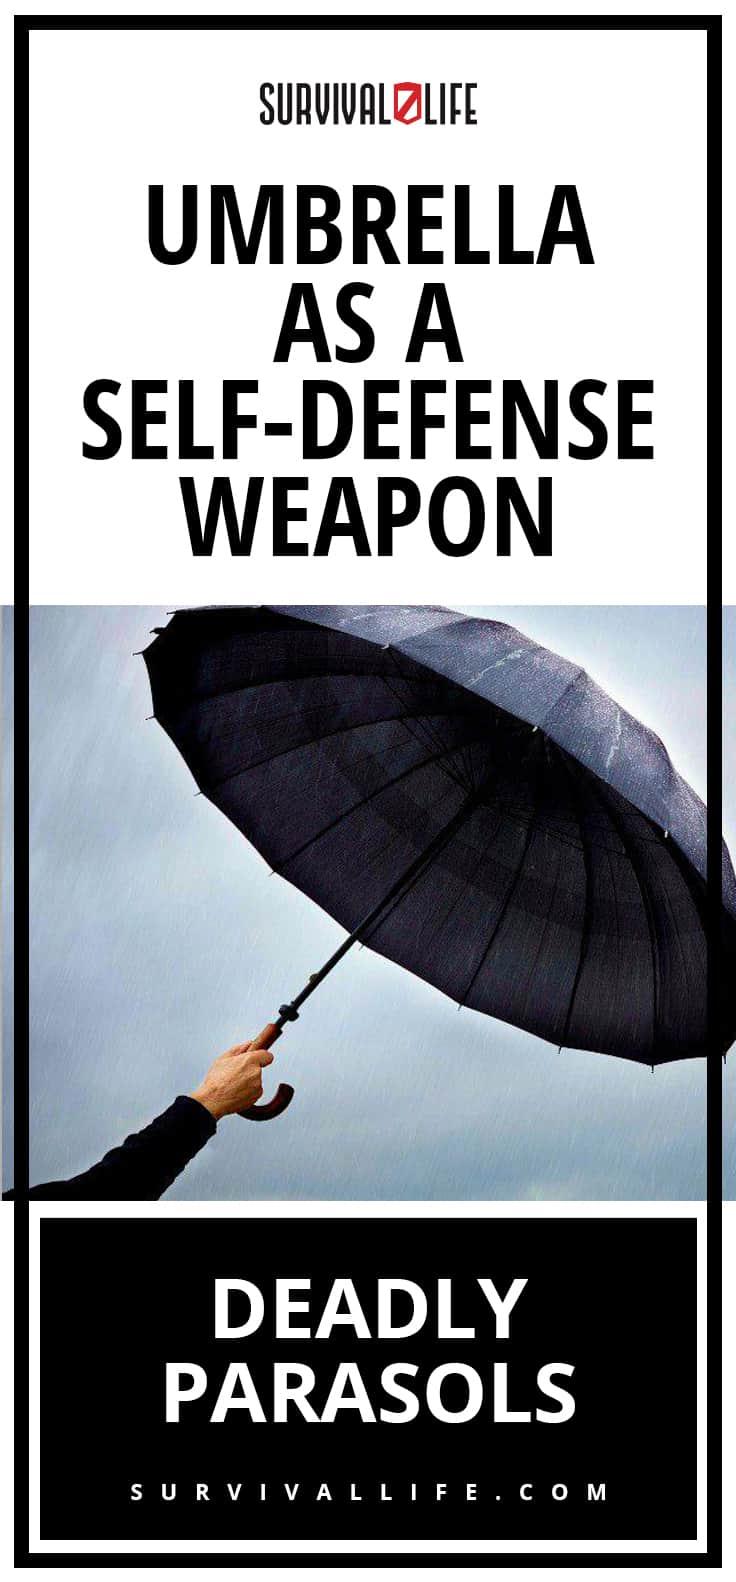 Deadly Parasols | Umbrella As A Self-Defense Weapon | https://survivallife.com/self-defense-umbrella/